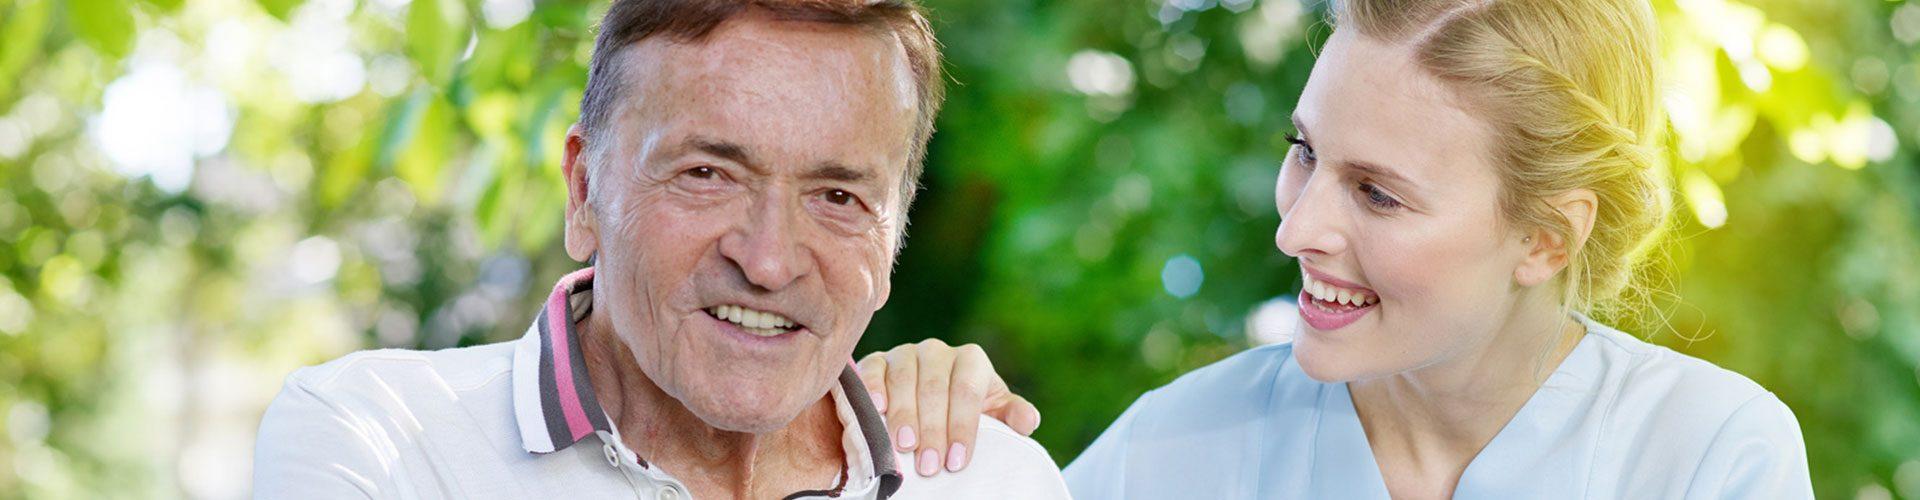 Älterer Mann mit Pflegefachkraft